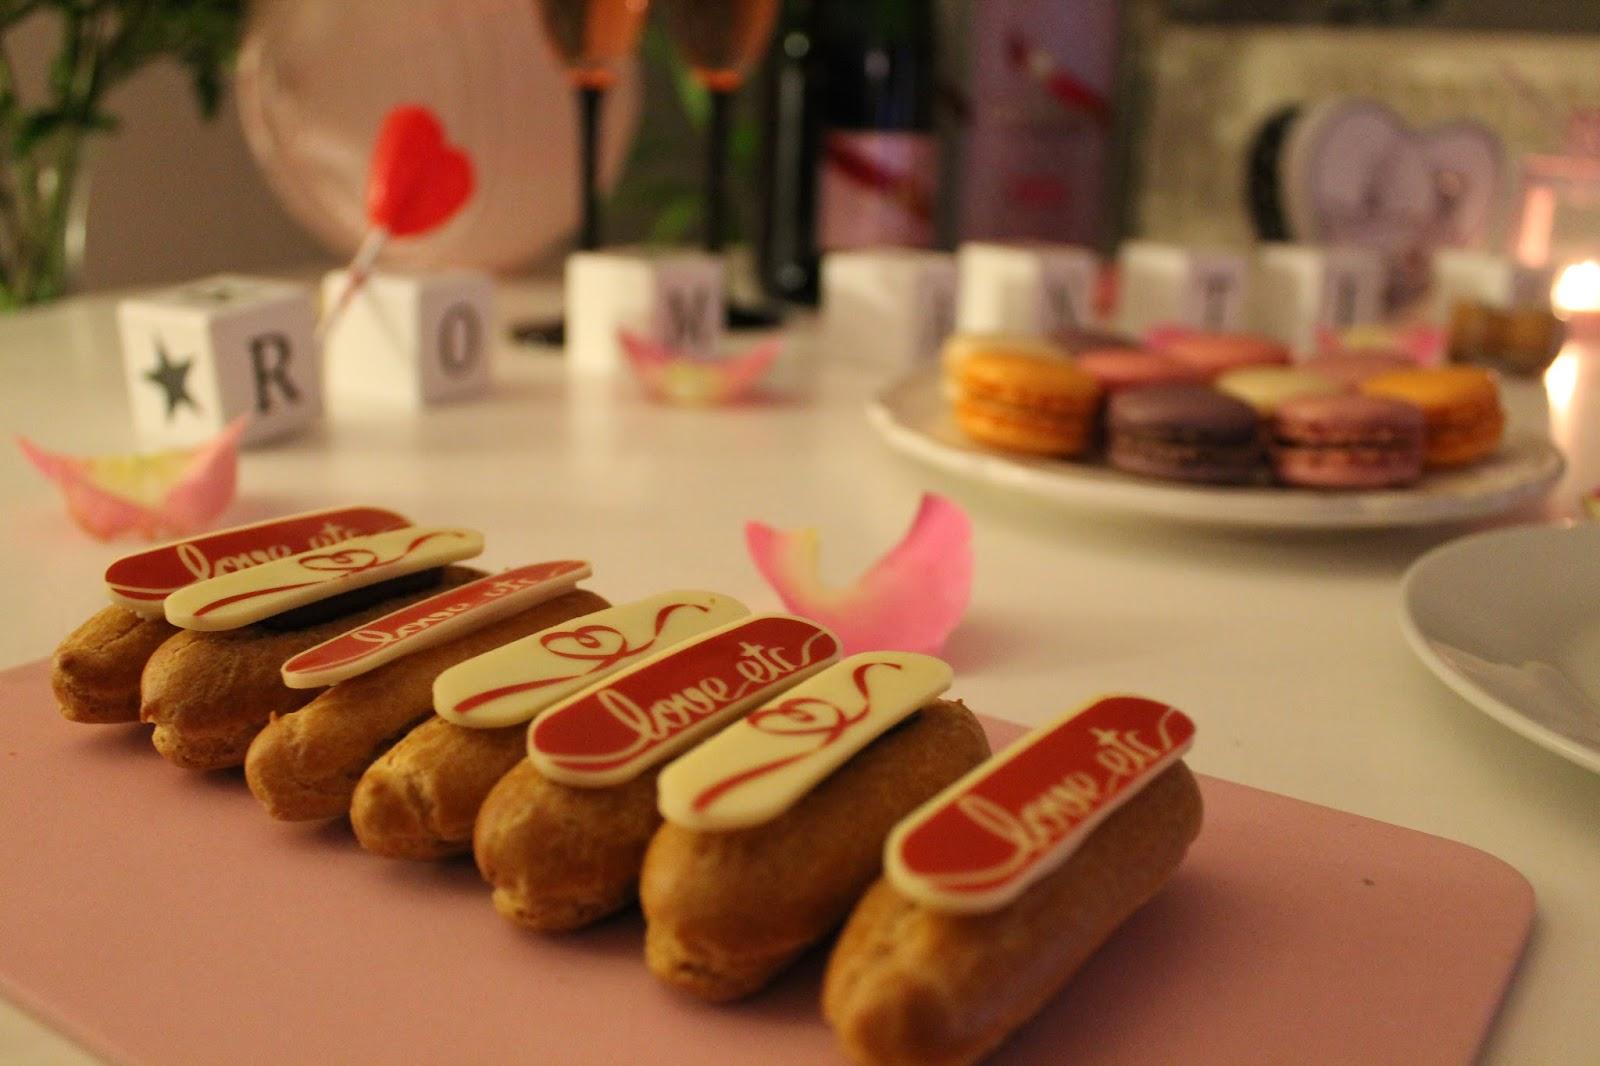 saint valentin coeur love amoureux valentines day gh mumm champagne rosé macarons picard éclairs rose